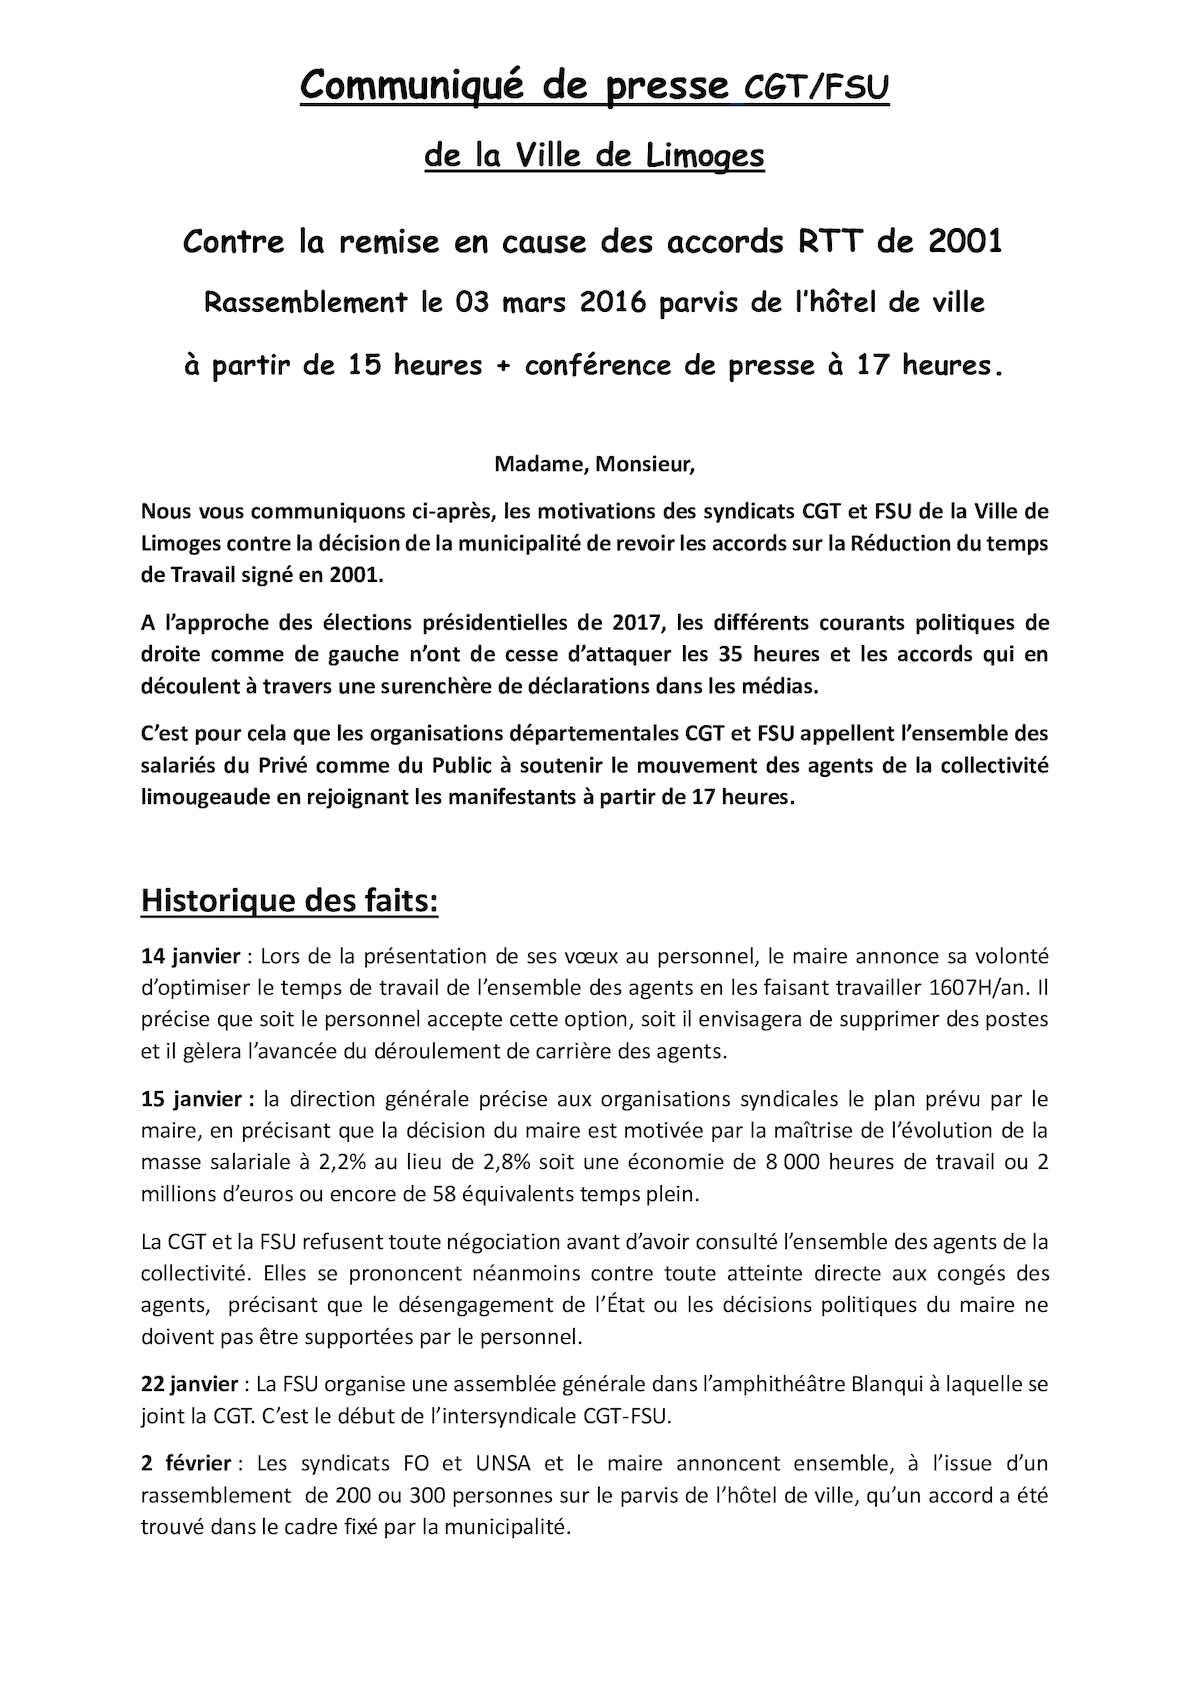 Calameo Communique De Presse Cgt Fsu Greve Du 03mars2016